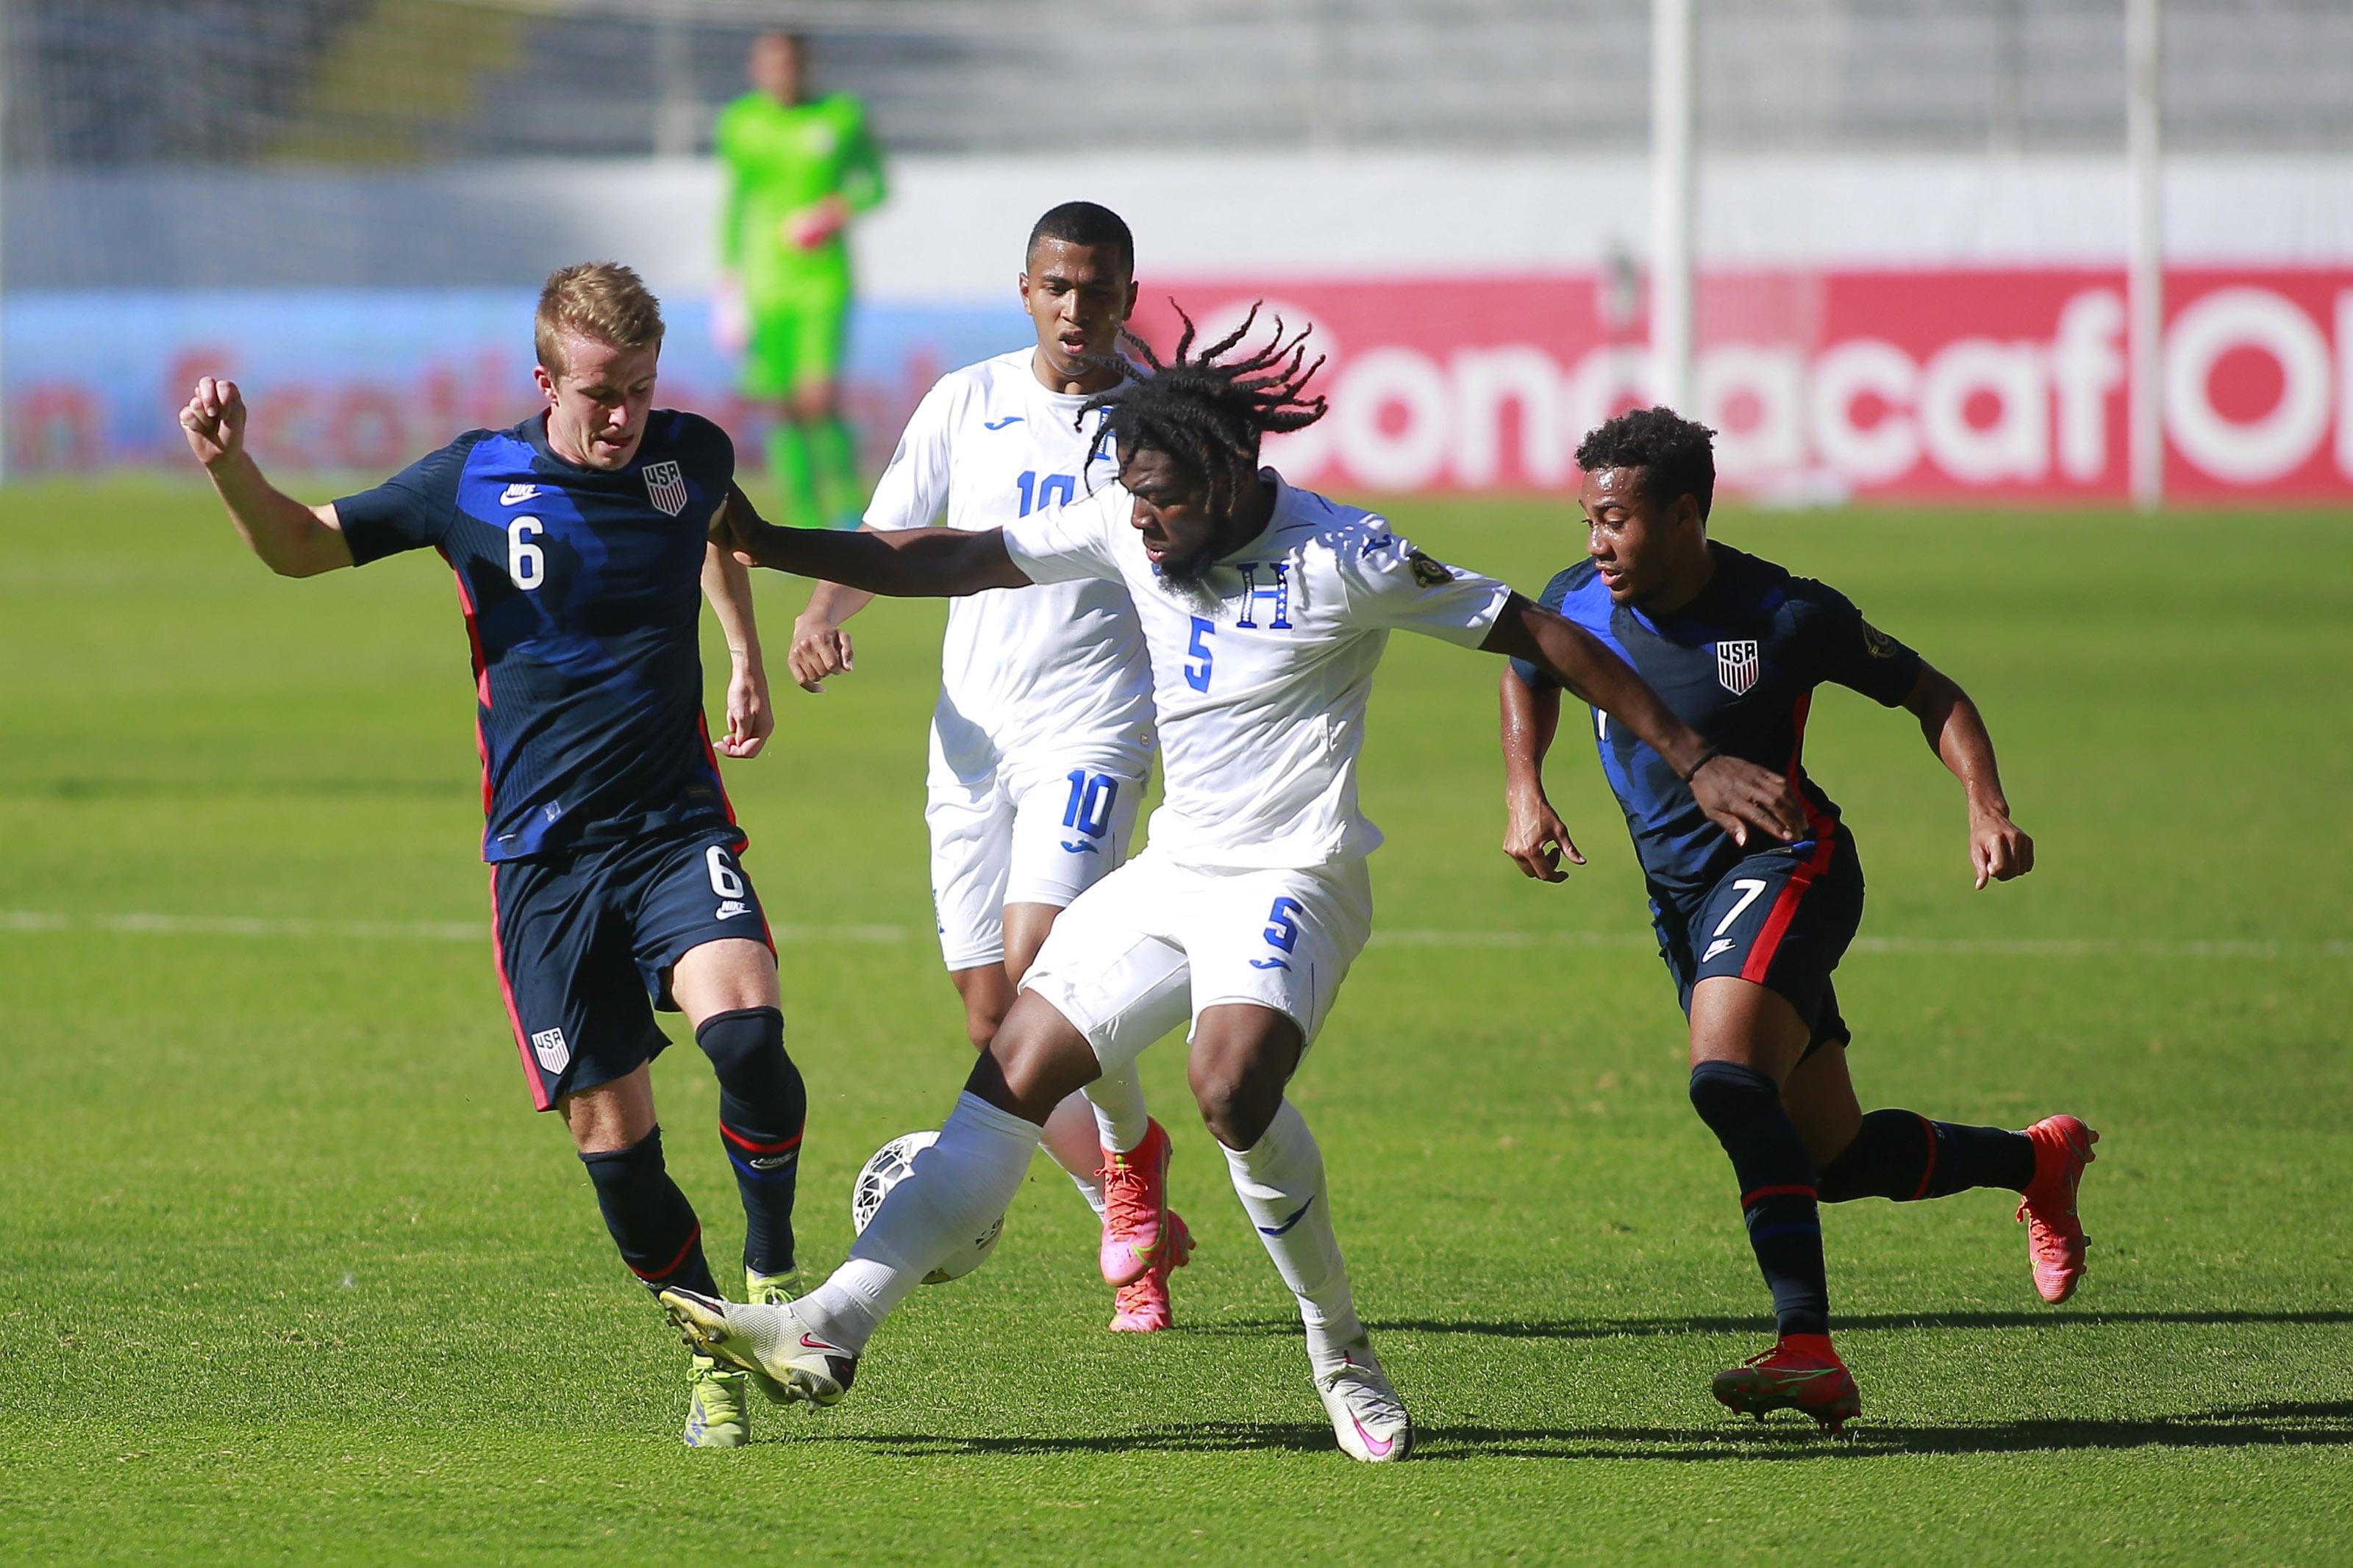 Honduras v USA - 2020 Concacaf Men's Olympic Qualifying Semifinals